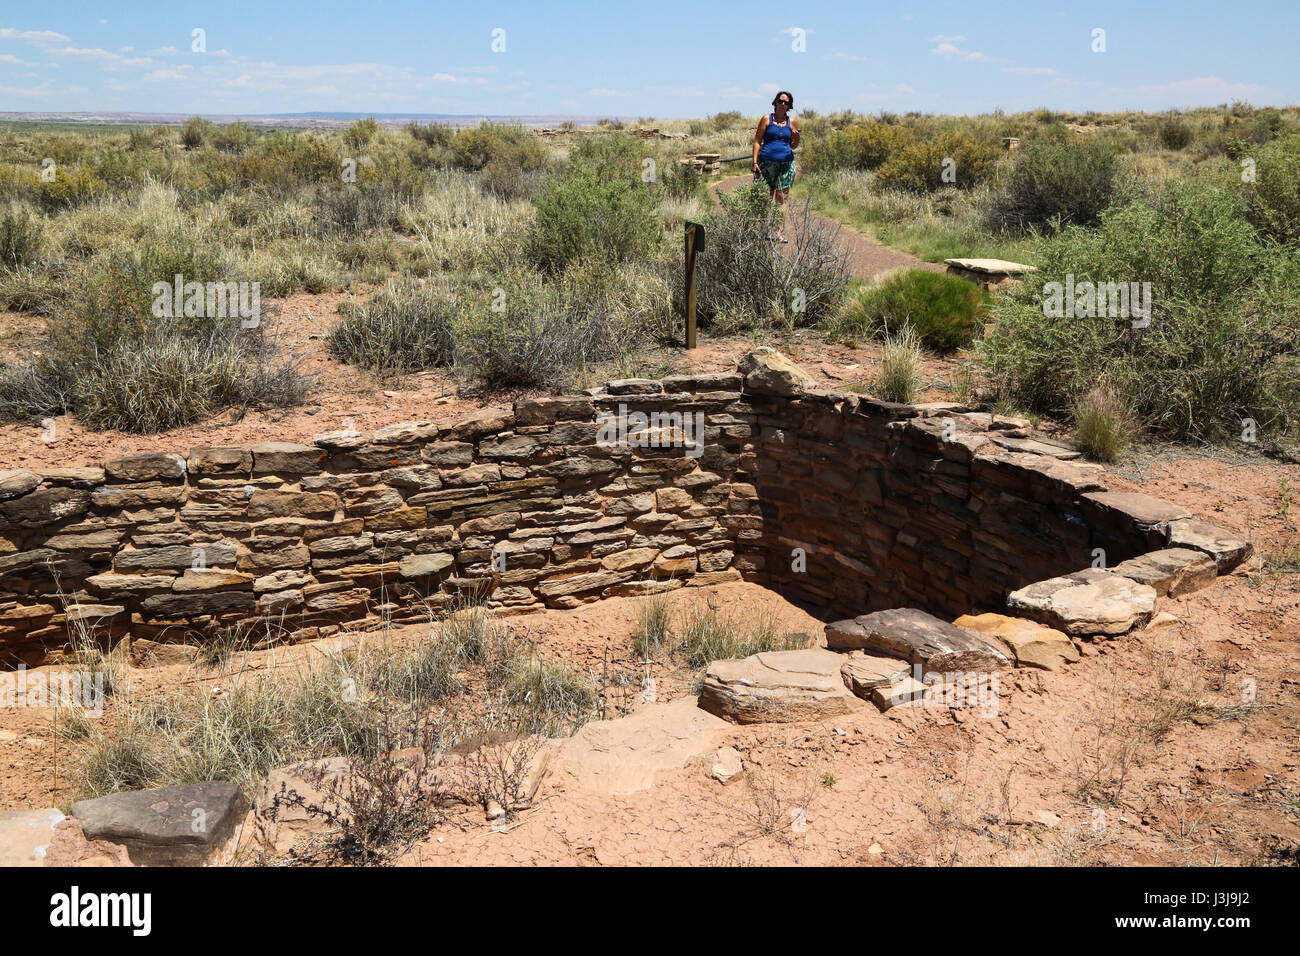 Los vestigios de antiguas viviendas en el Desierto pintado de Arizona Imagen De Stock